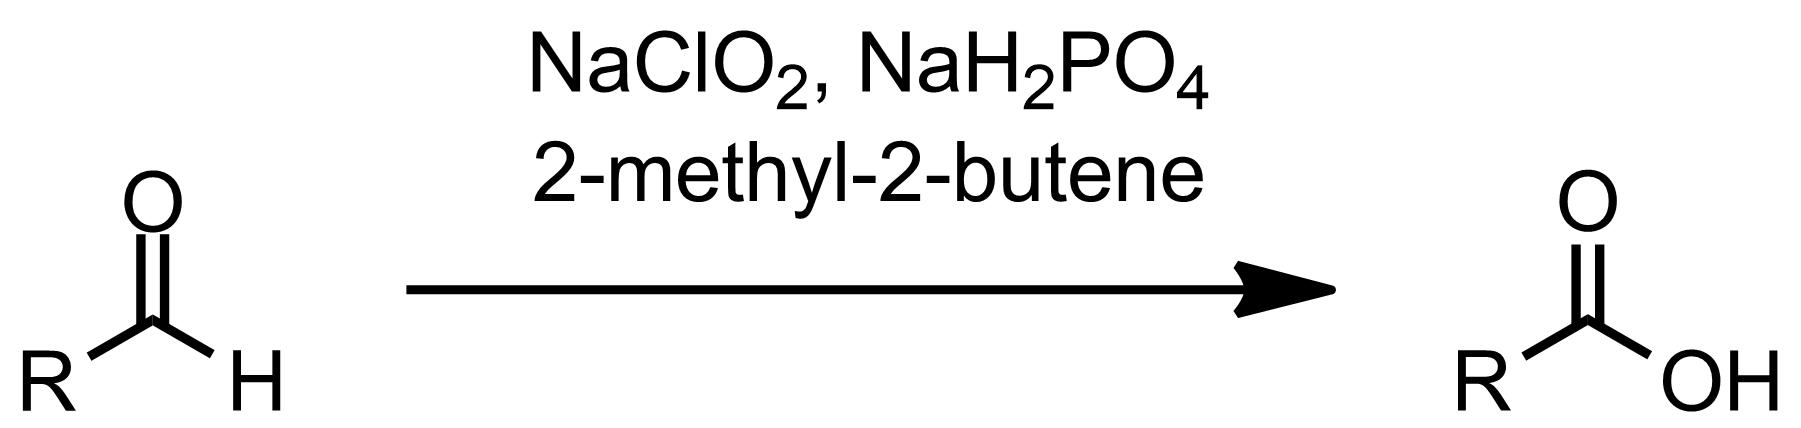 Schematic representation of the Pinnick-Lindgren Oxidation.